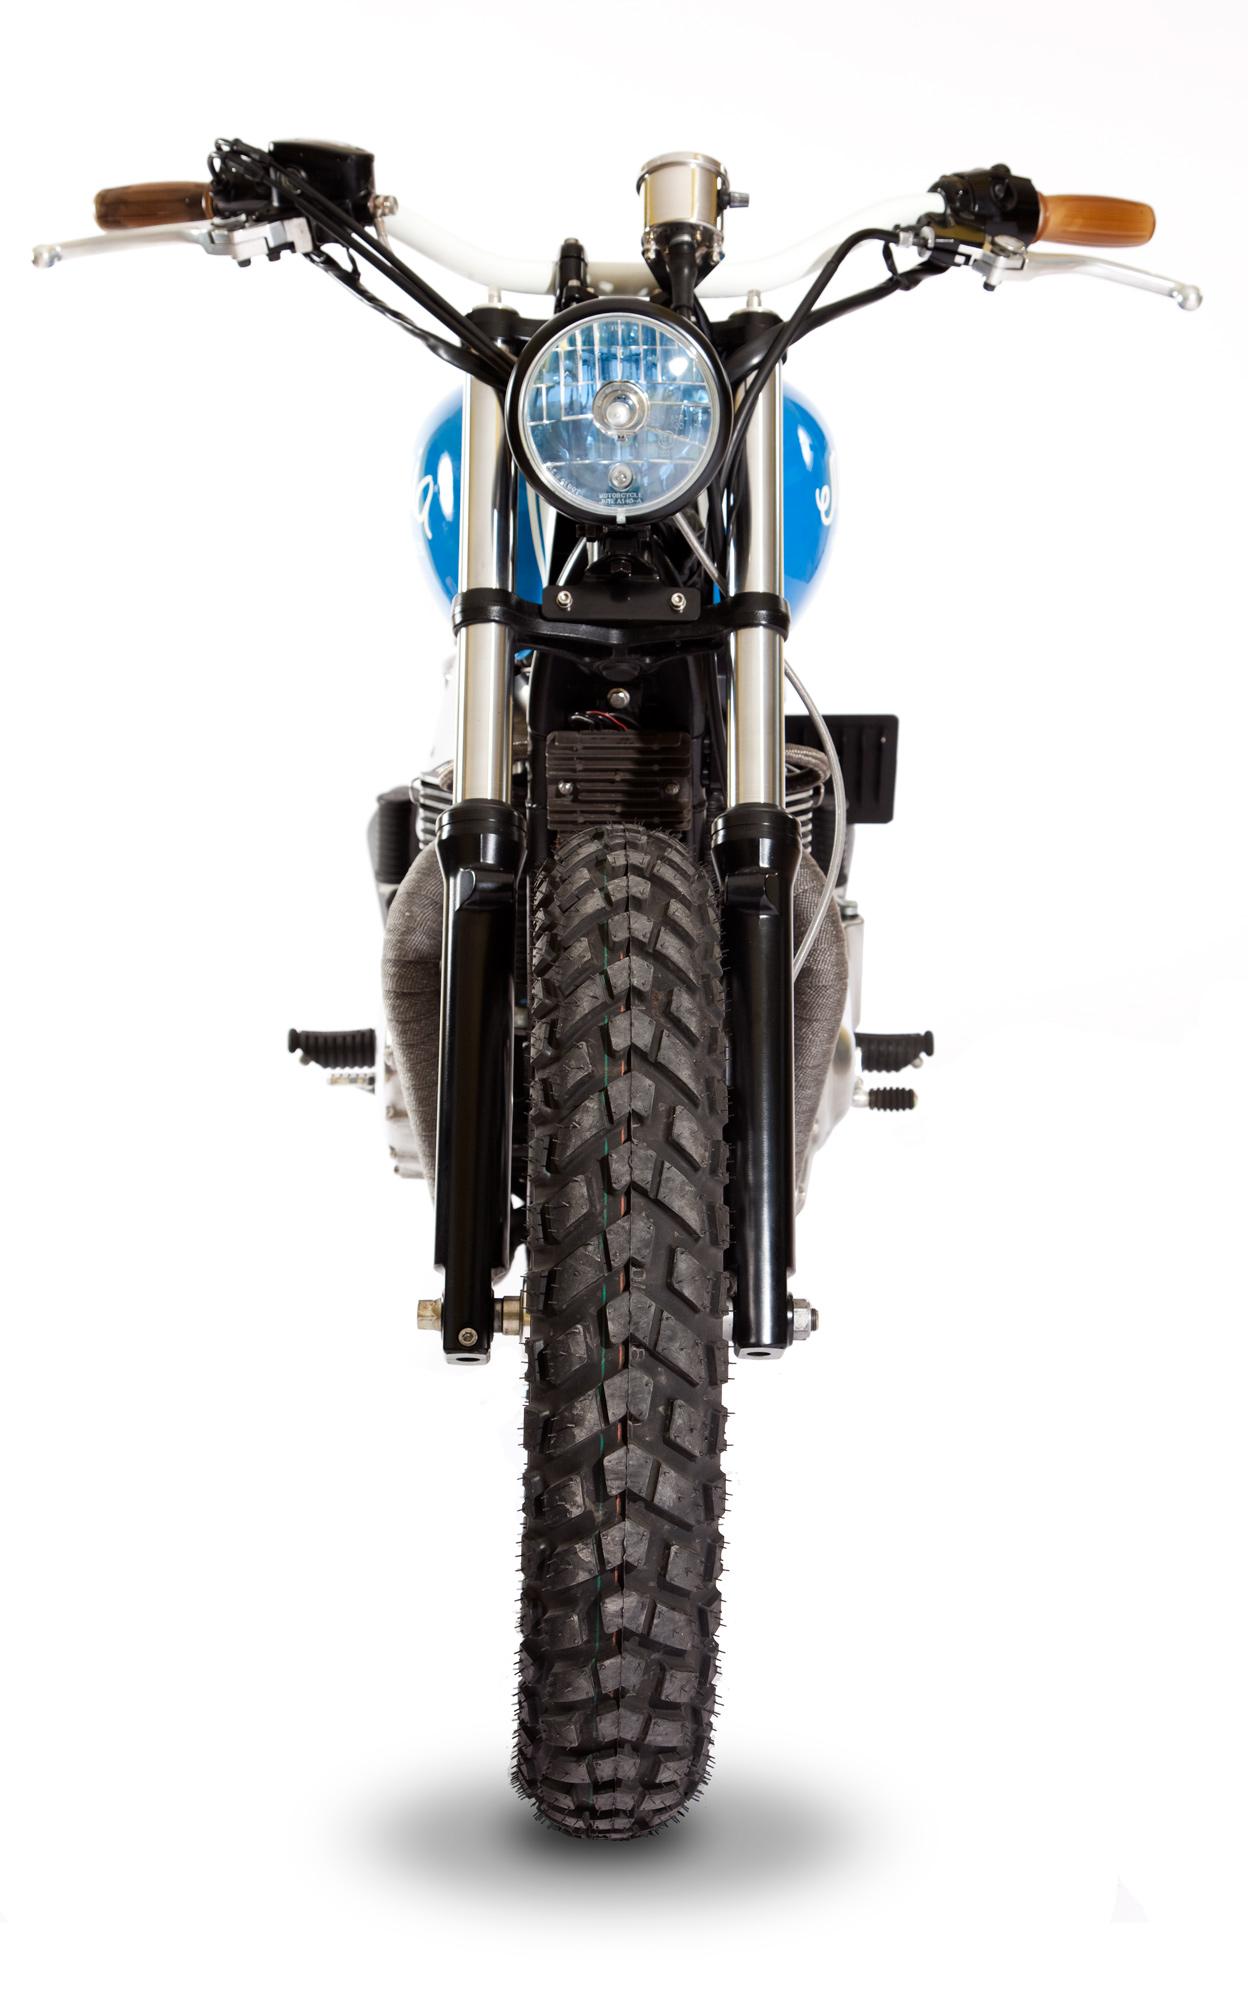 maria_motorcycles_triumph_thruxton_mightyblue_7292